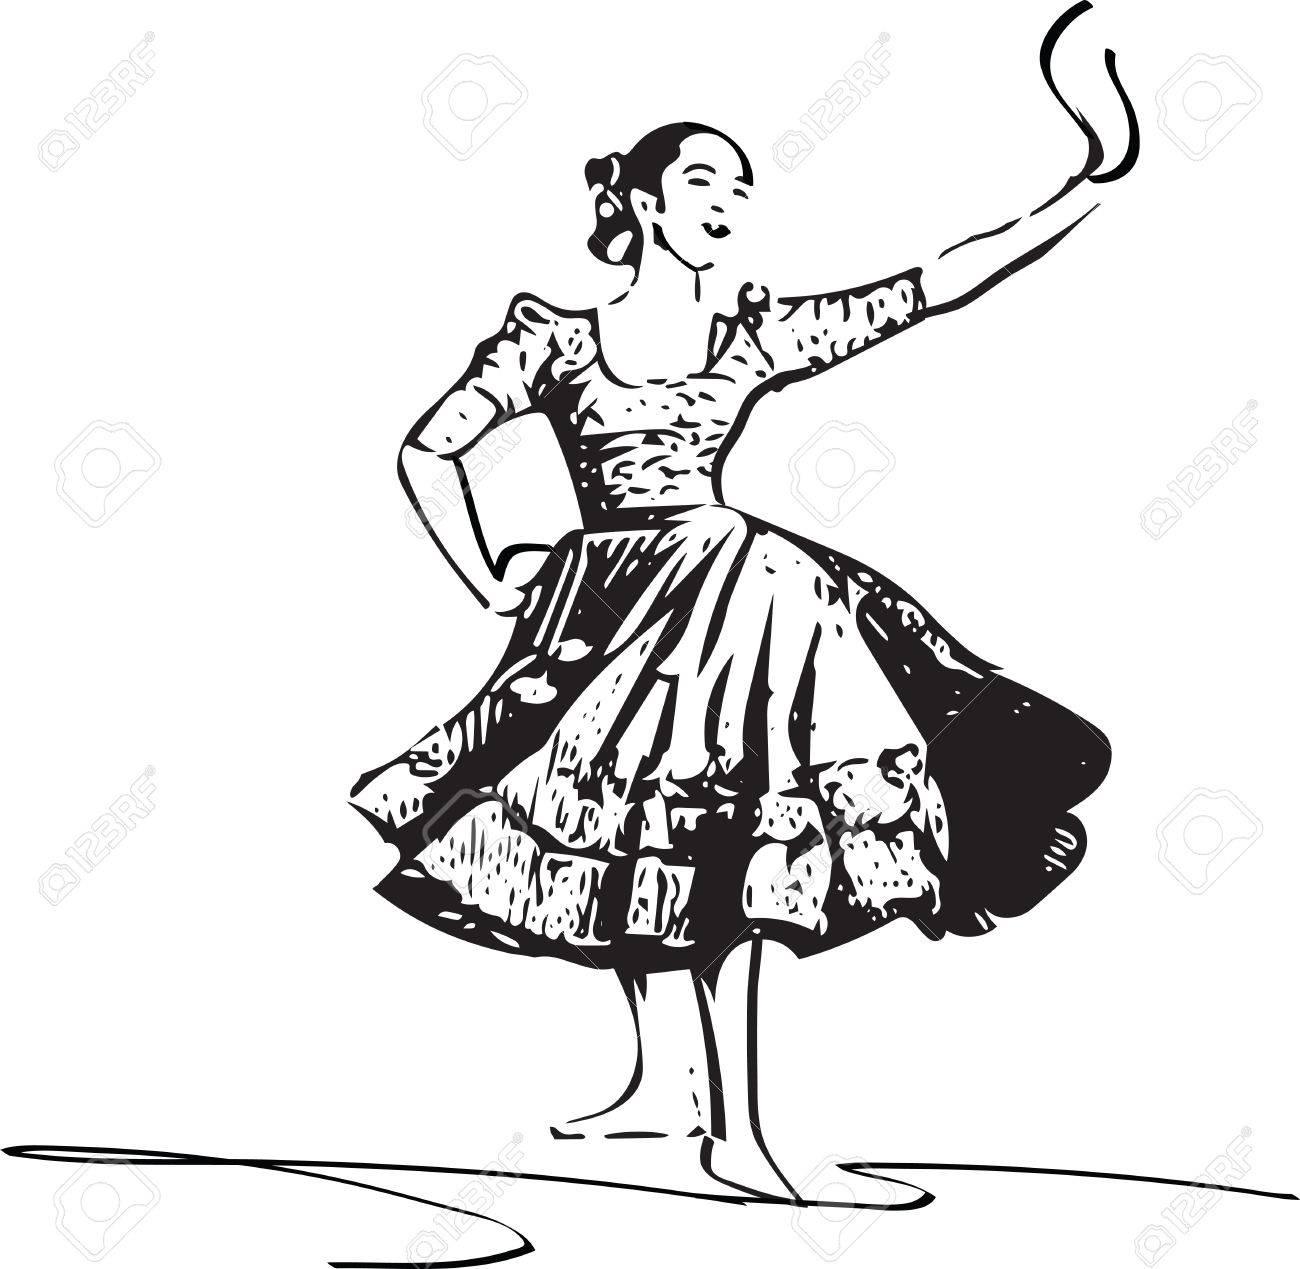 1300x1269 Illustration Of Woman Dancing Marinera. Peruvian Dancing. Royalty